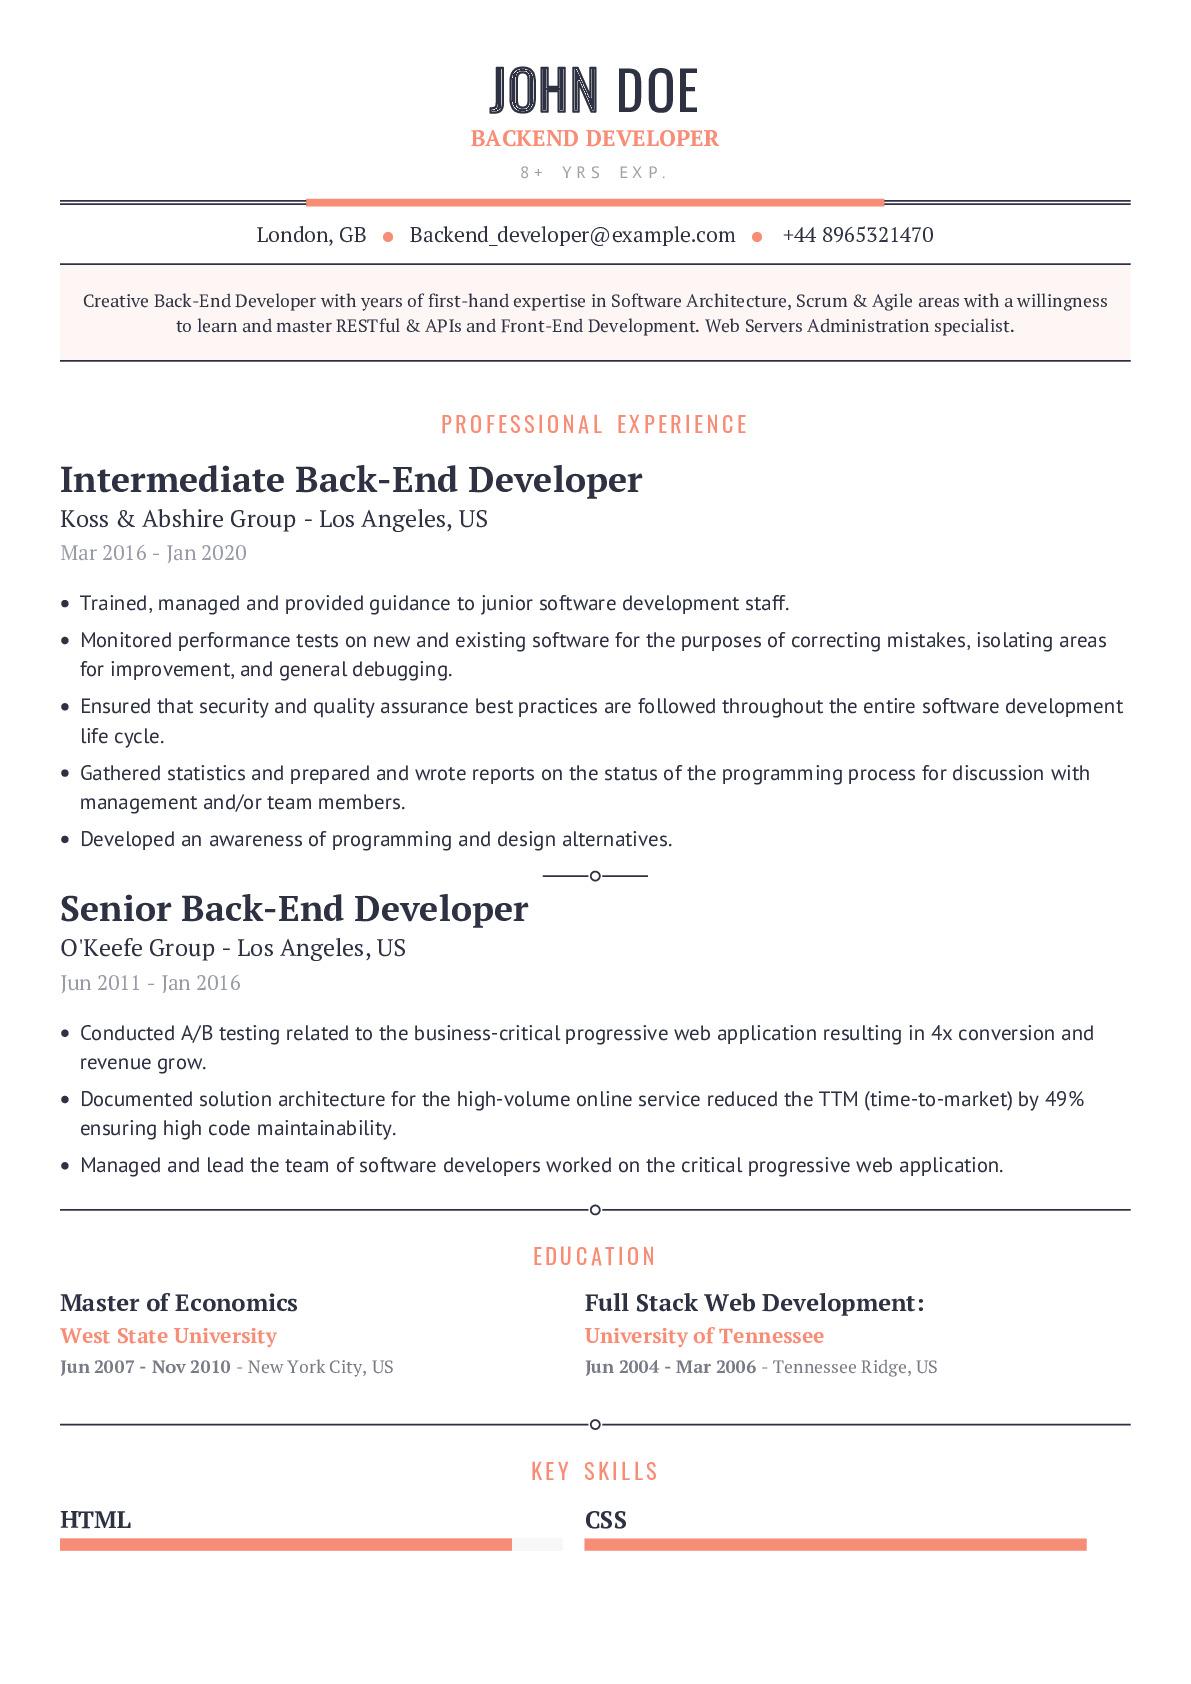 Backend Developer Resume Example